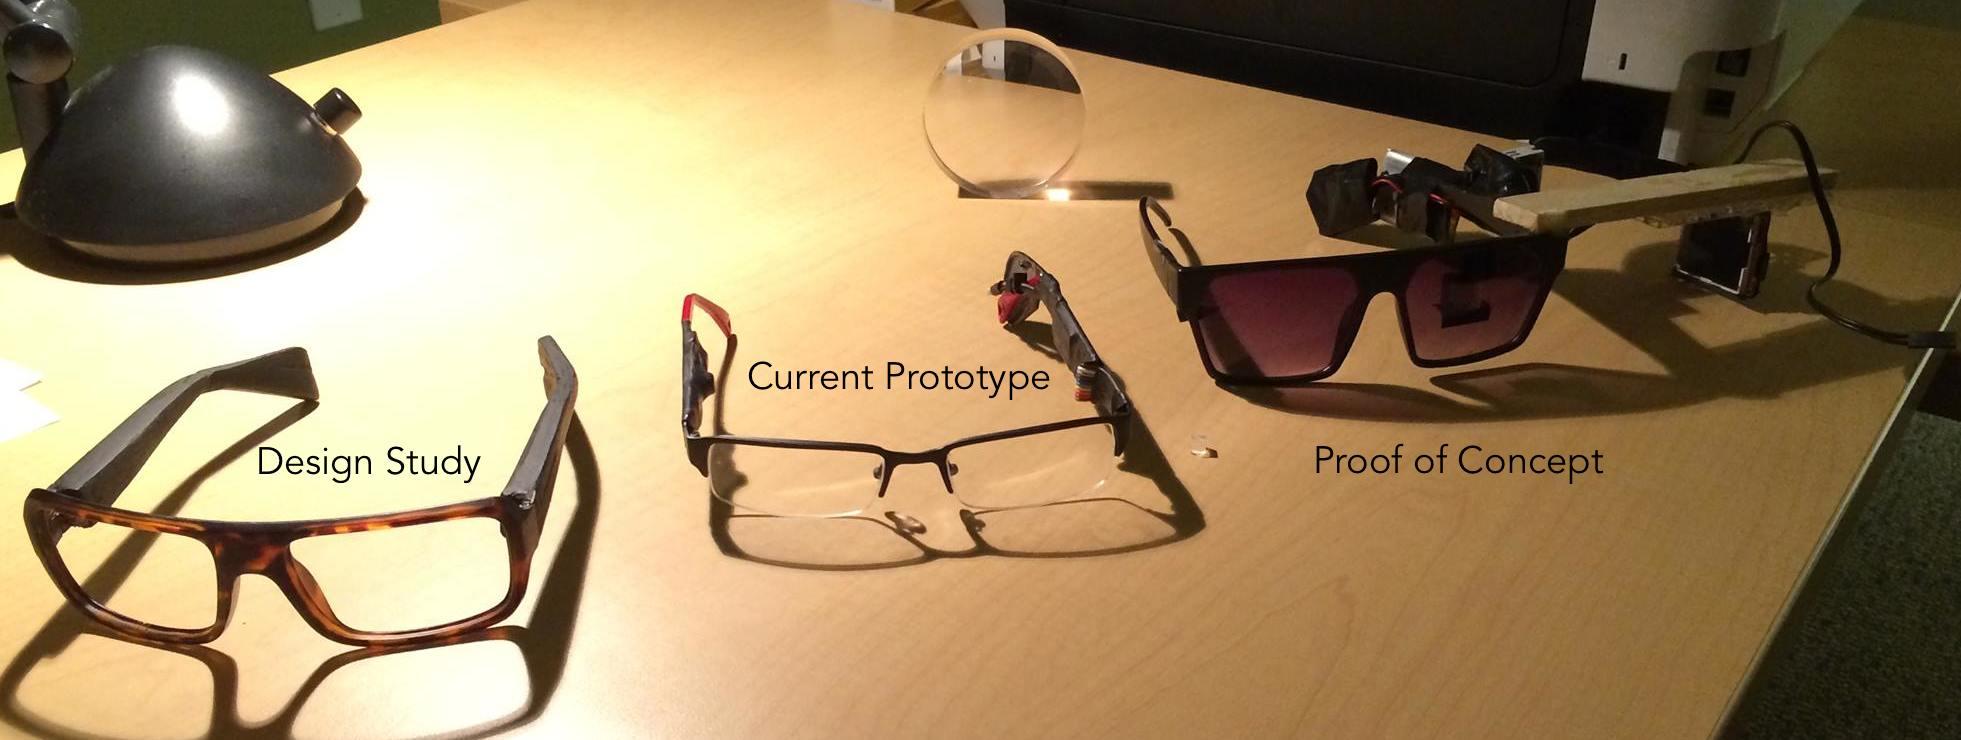 laforge seeks funding for fashion friendly icis smart glasses